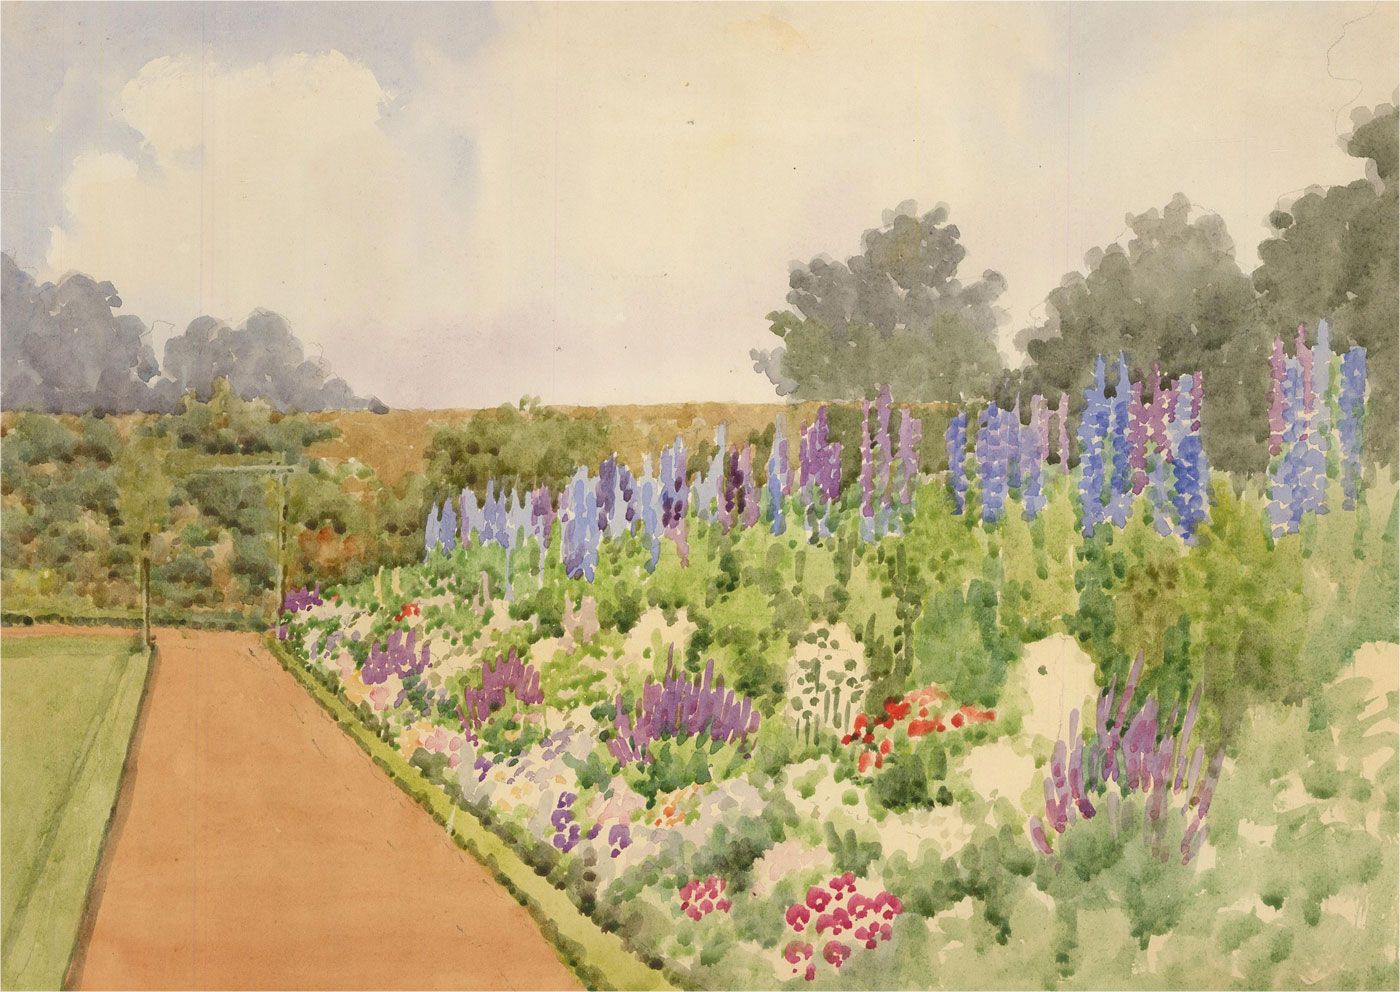 Raymond Turner Barker (1872-1945) - 1927 Watercolour, Herbaceous Border